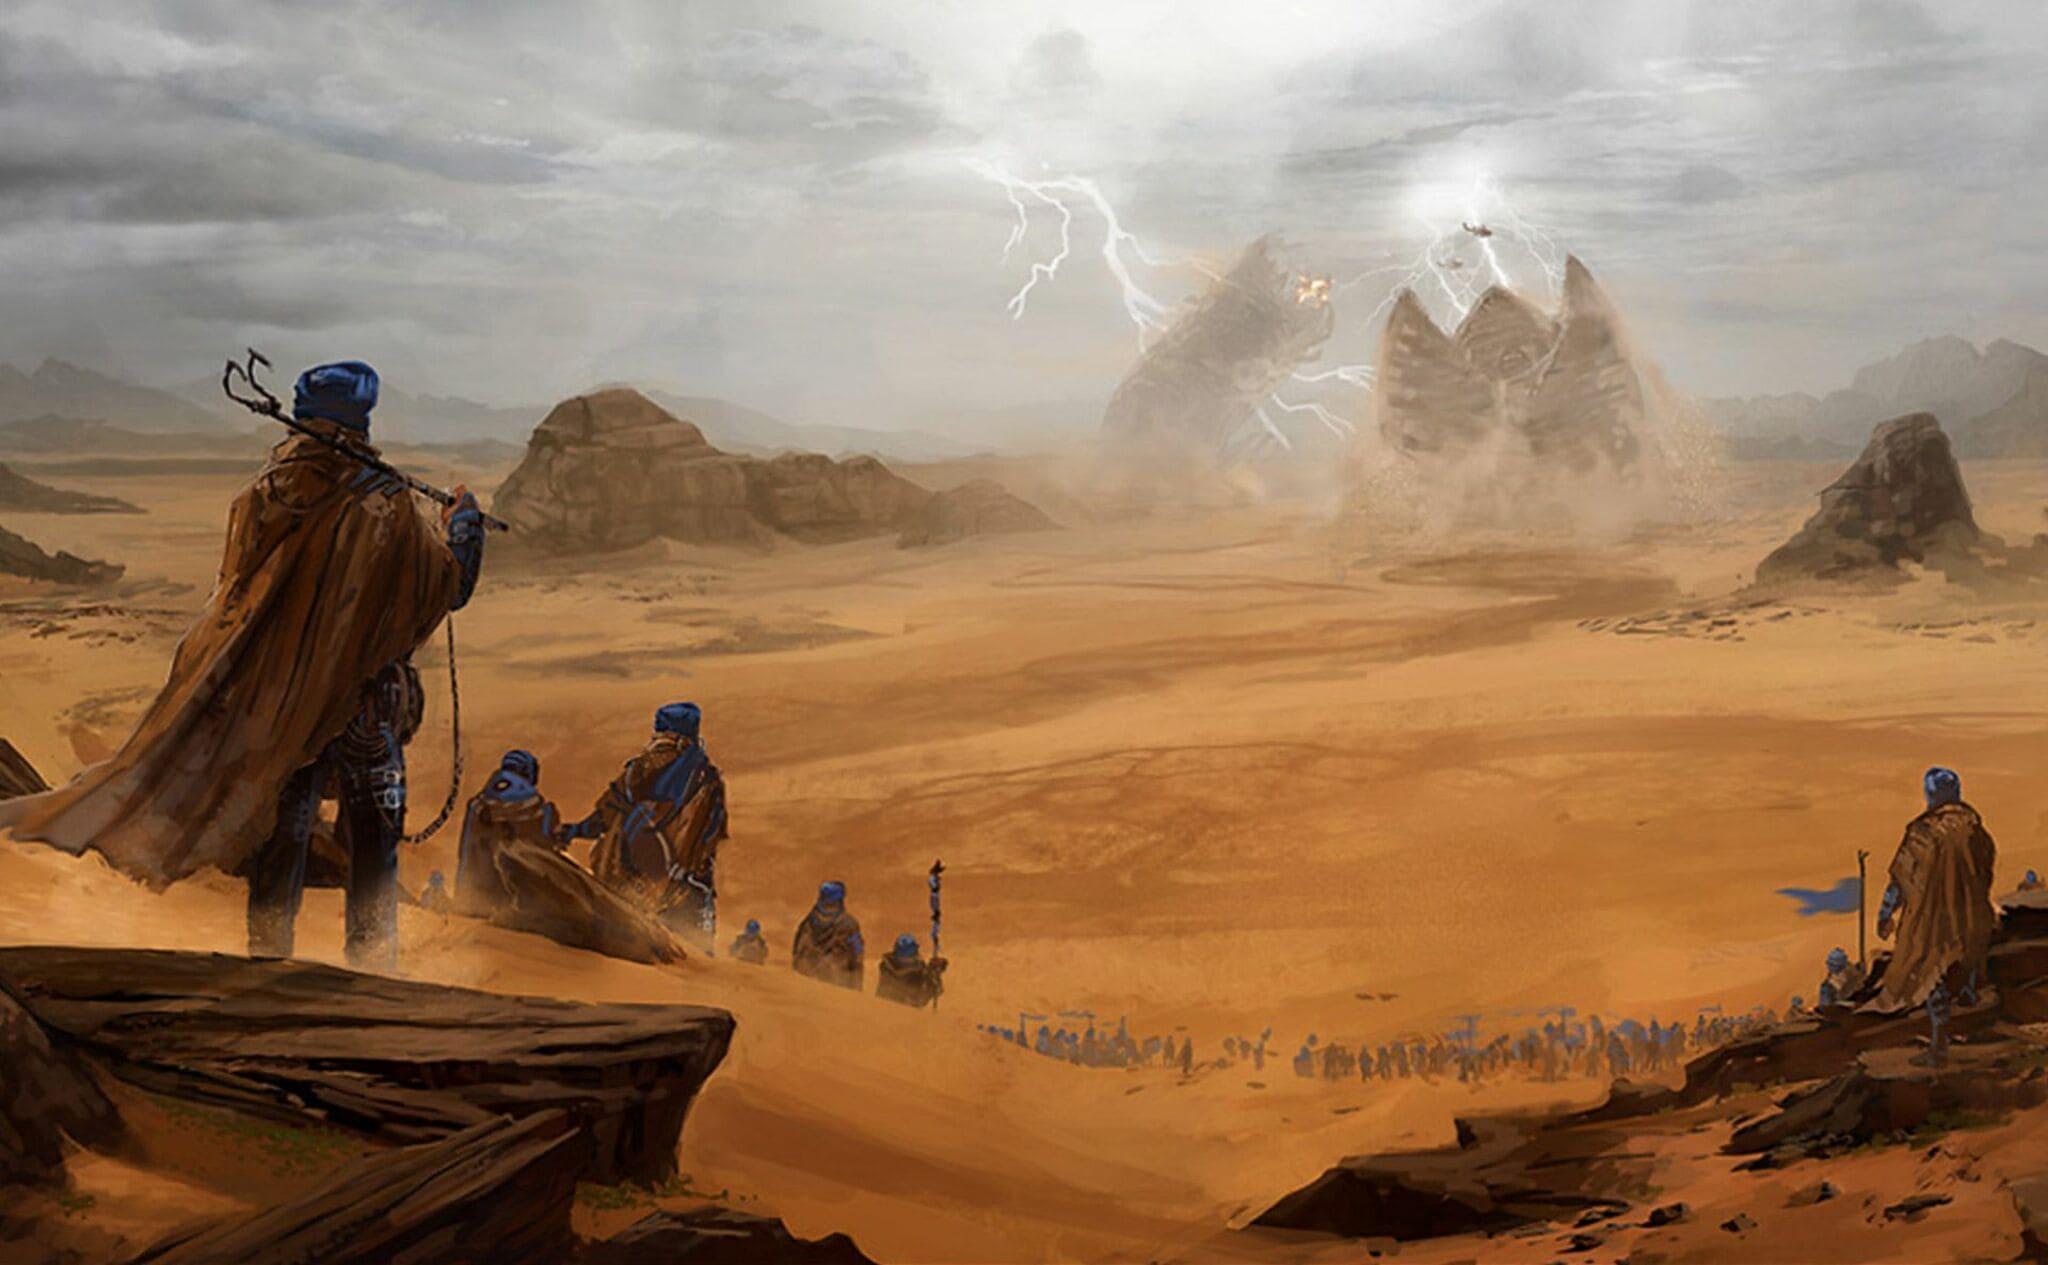 Dune illustration